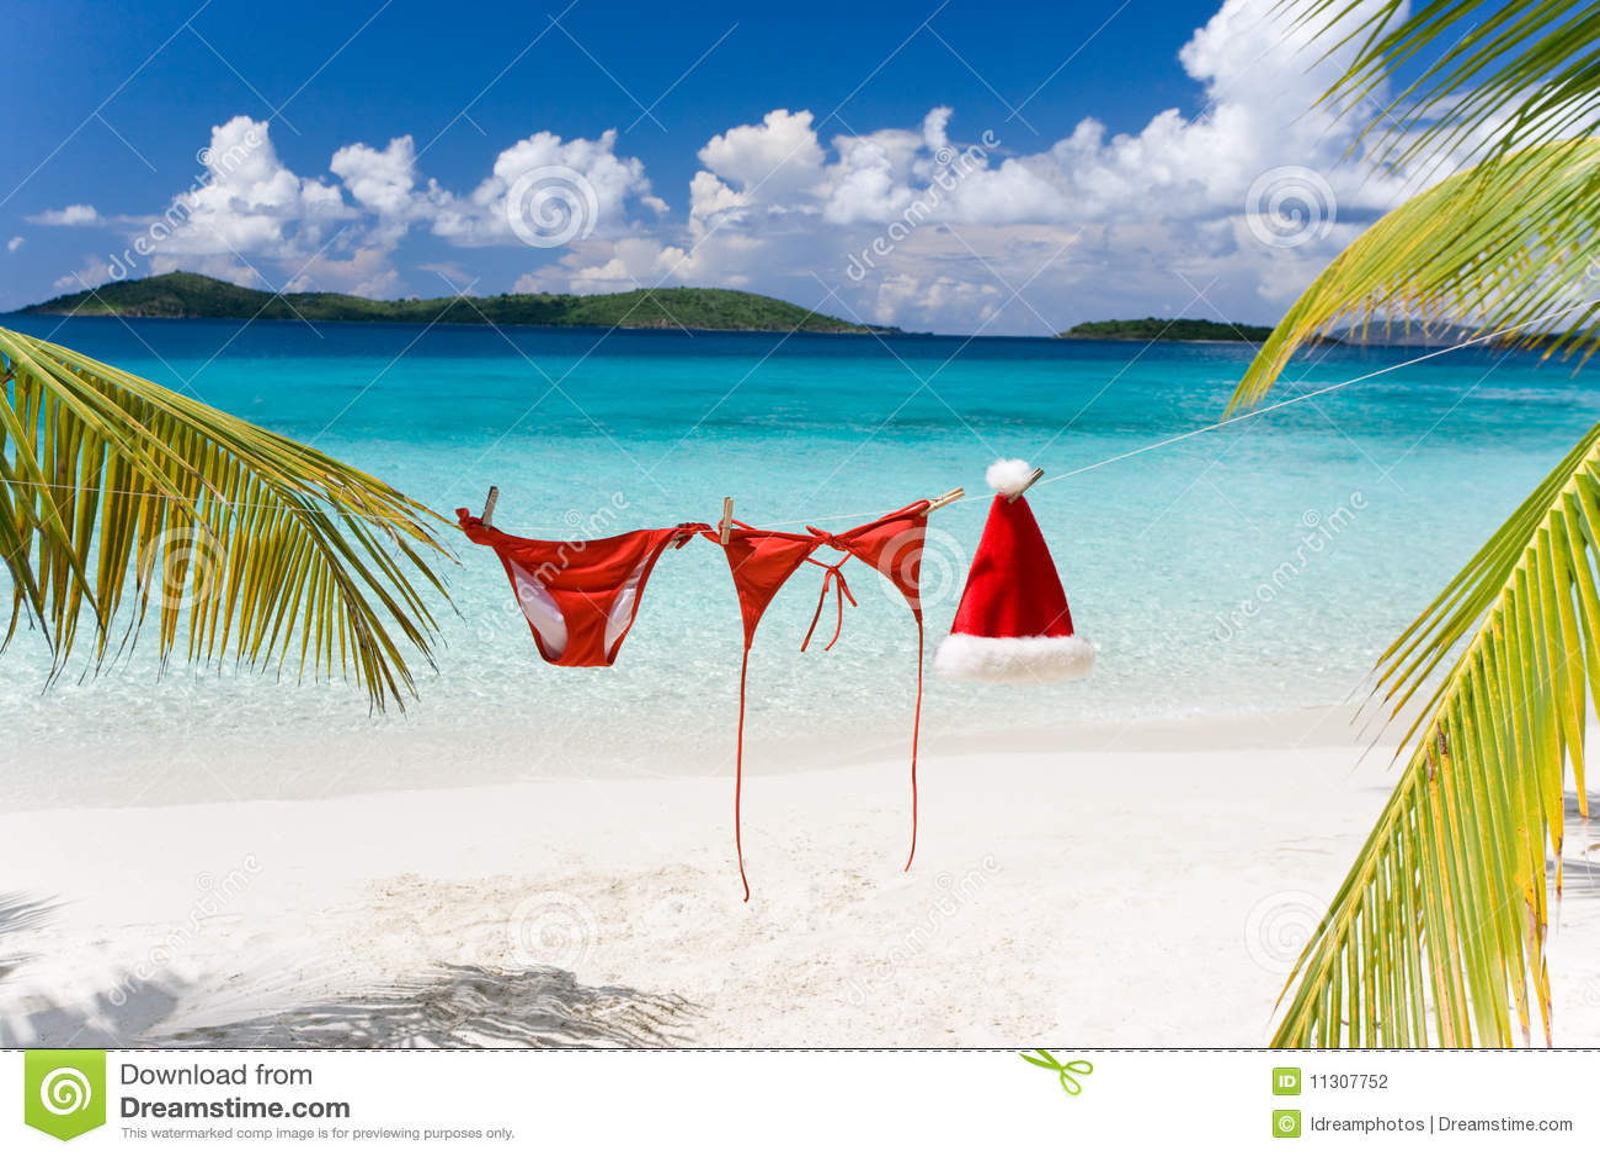 Christmas Beach.Tropical Christmas Beach Stock Photo Image Of Holiday